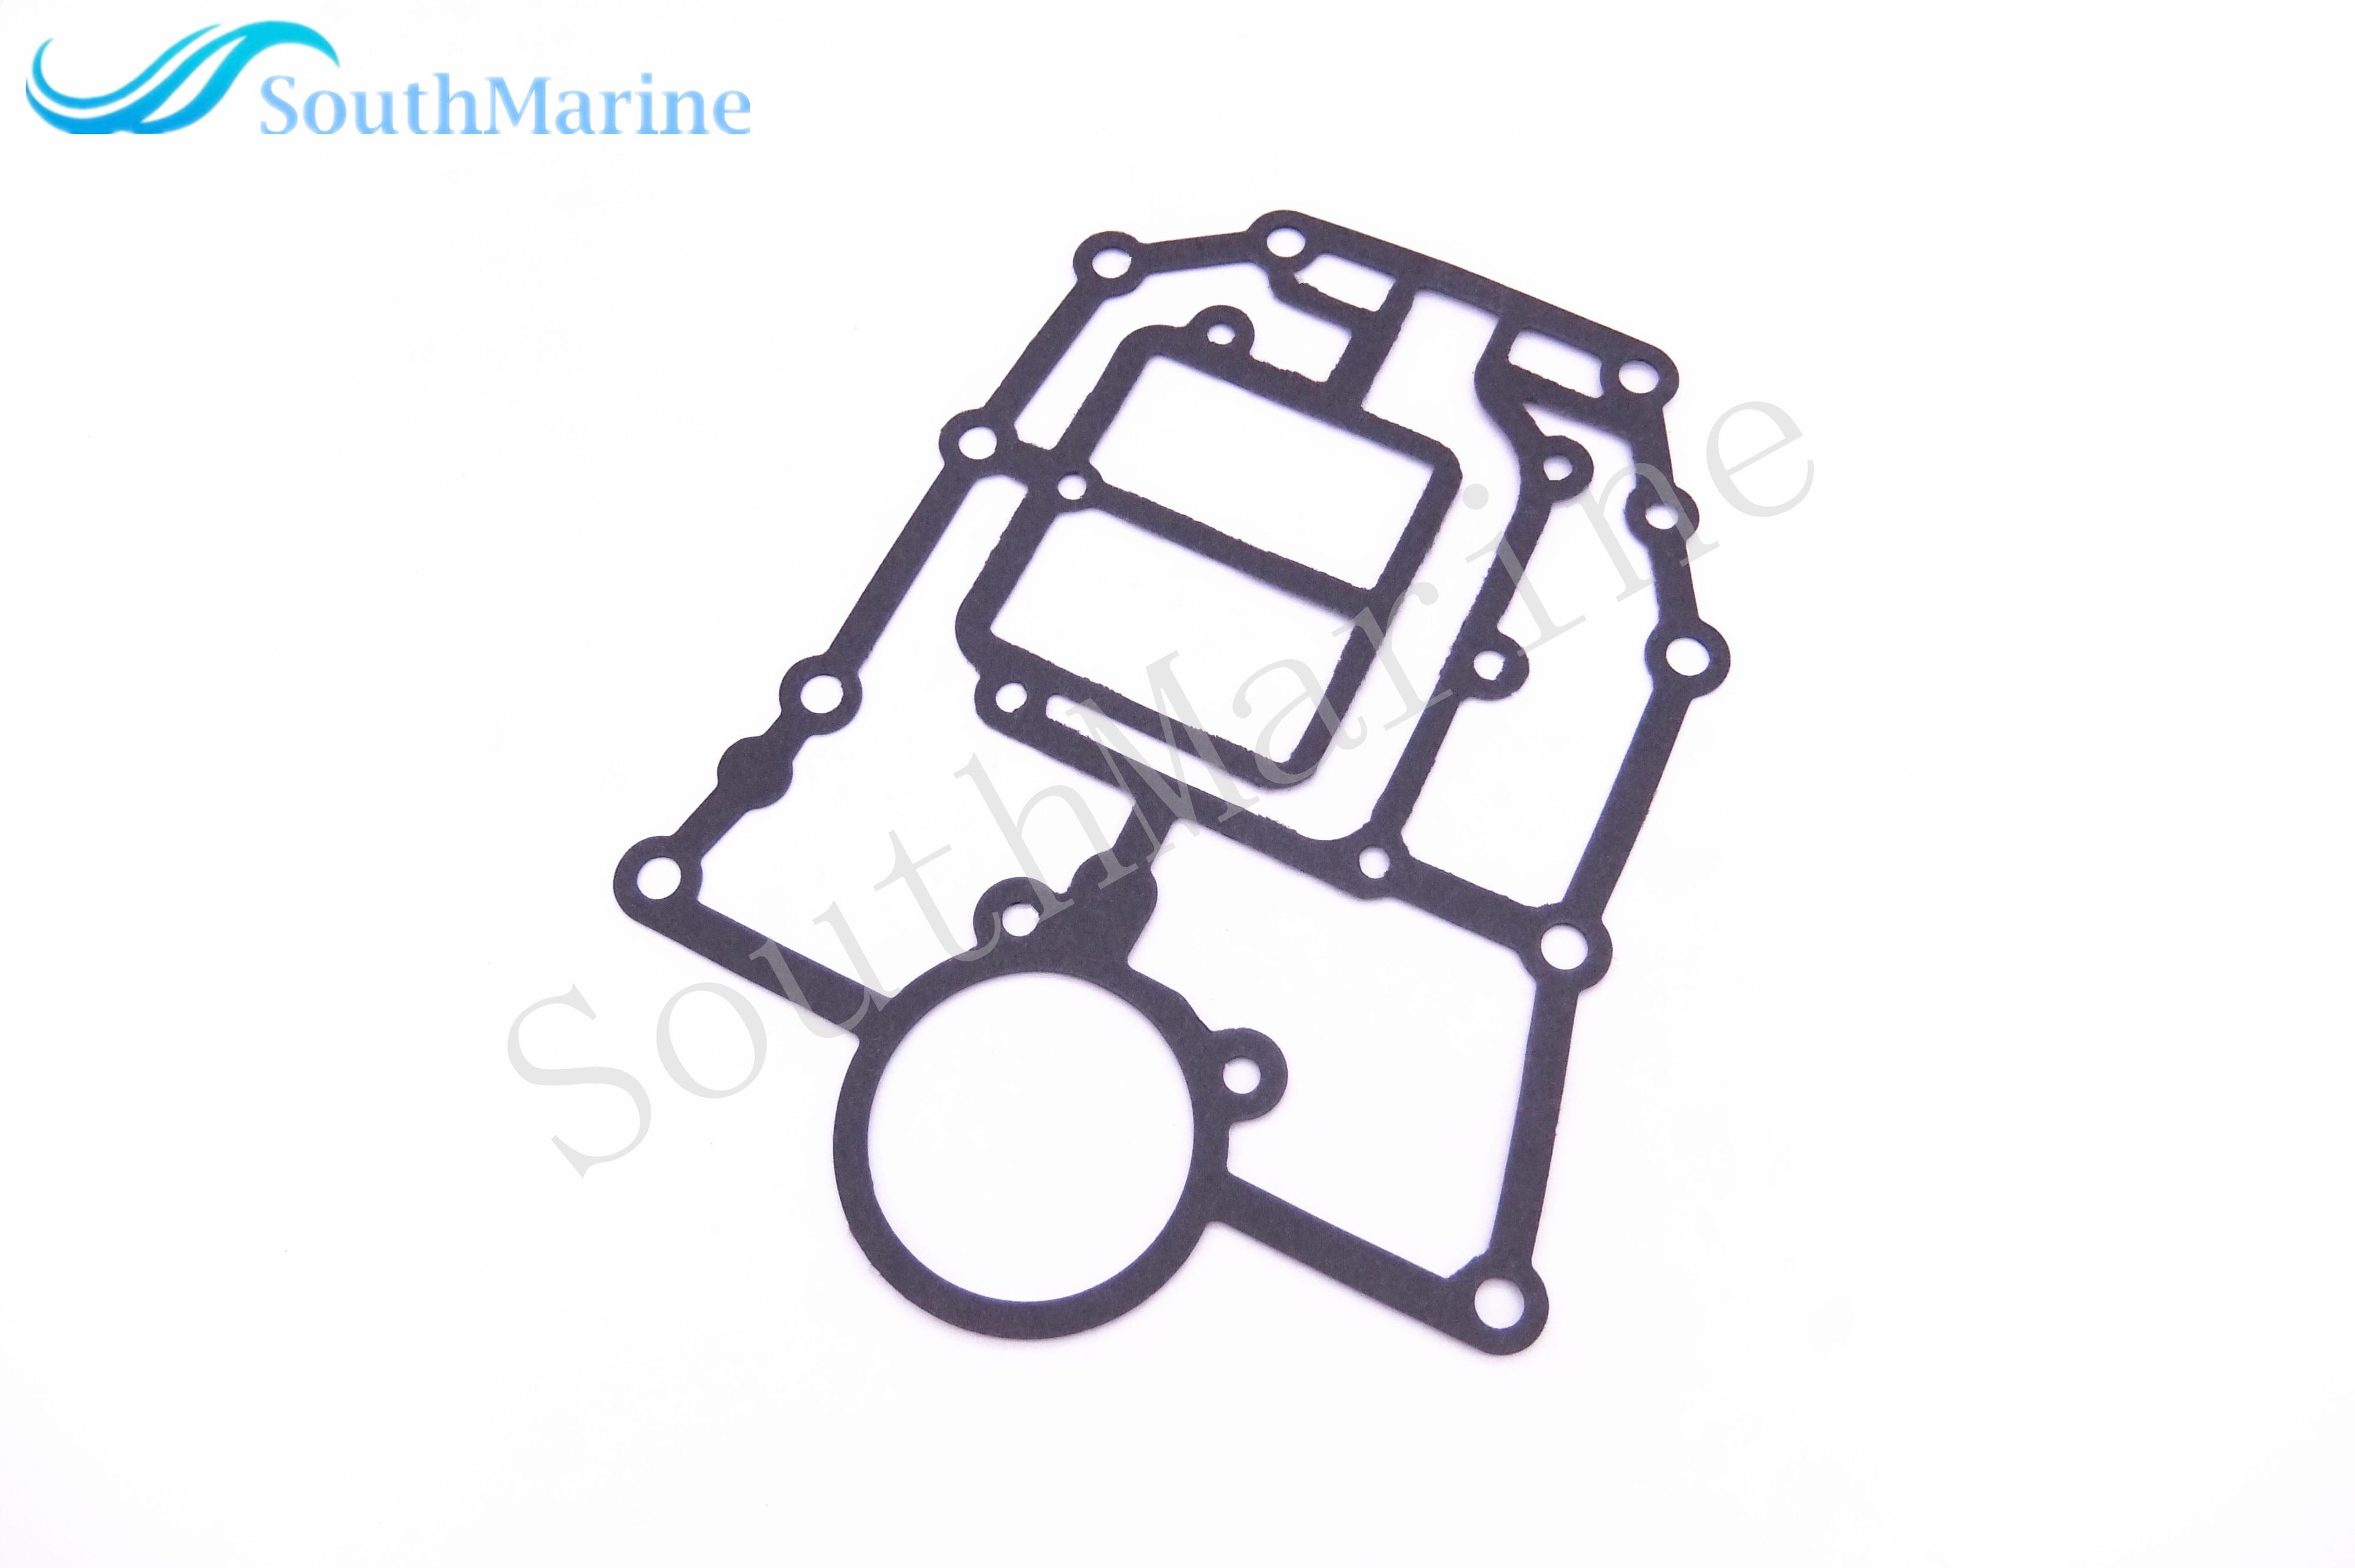 11433-94412 Boat Motor Gasket Under Oil Seal for Suzuki 40HP DT40 Outboard Engine 11433-94411